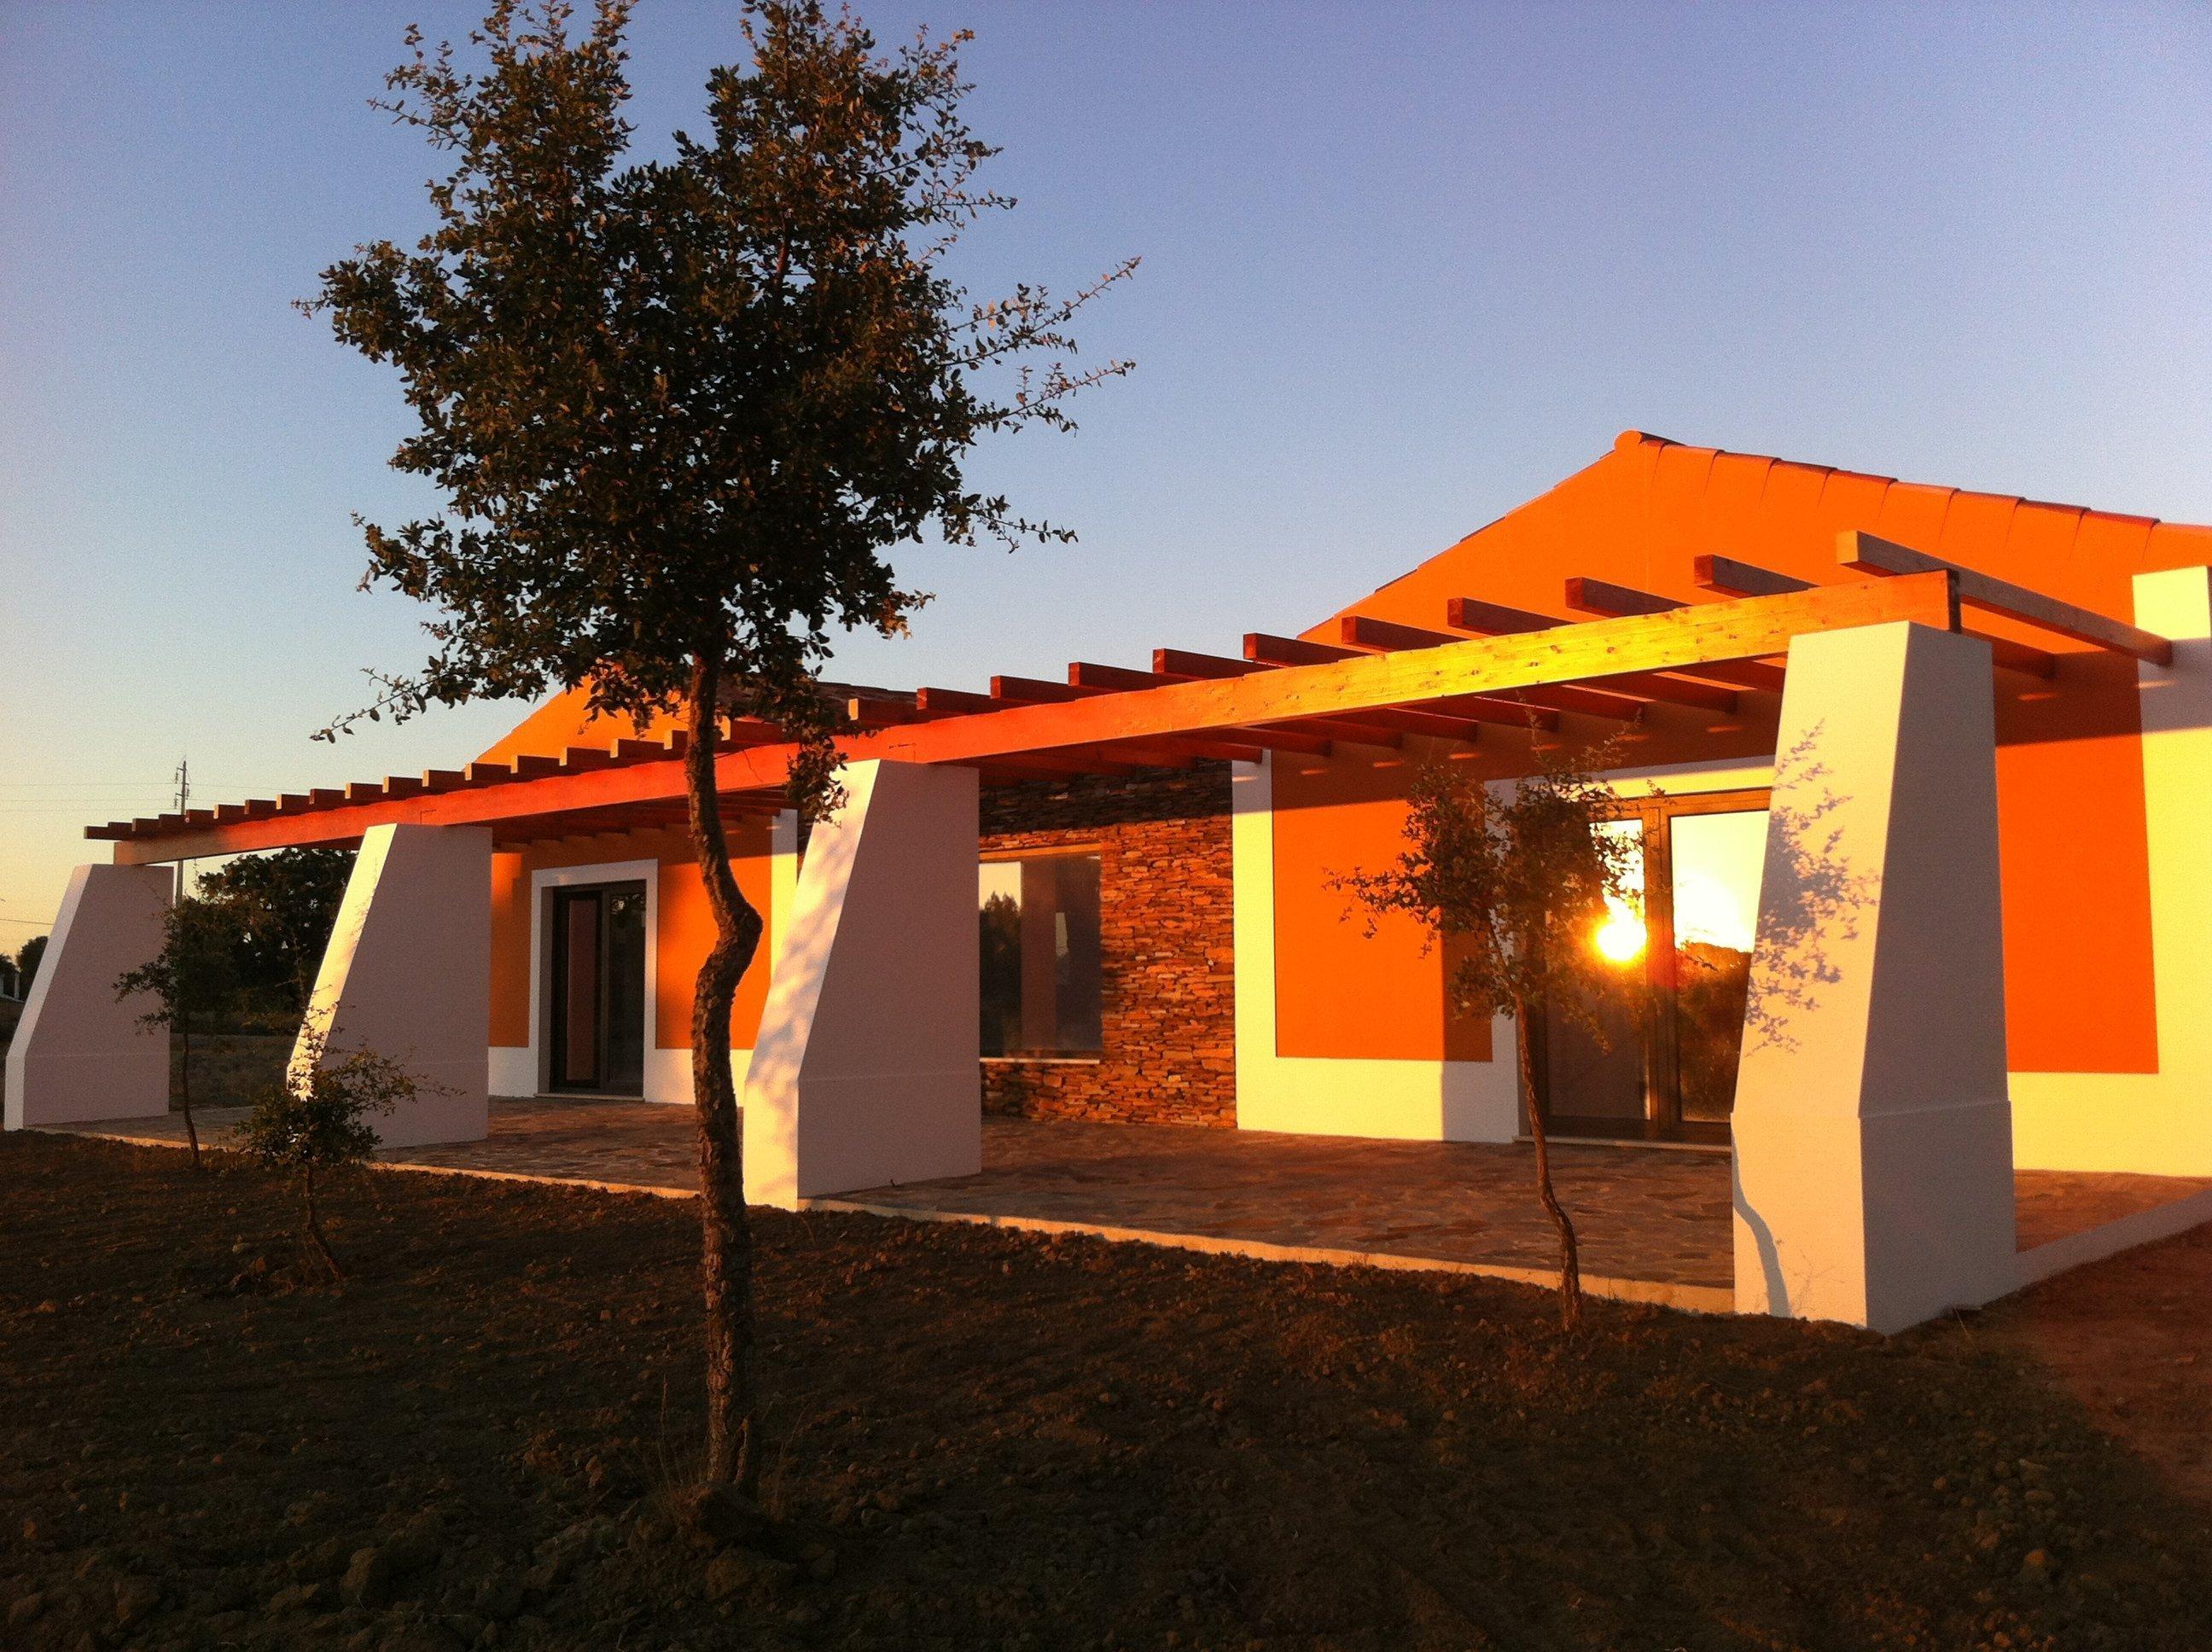 Museum of the sea and land of carrapateira casas brancas - Entradas de casas de campo ...